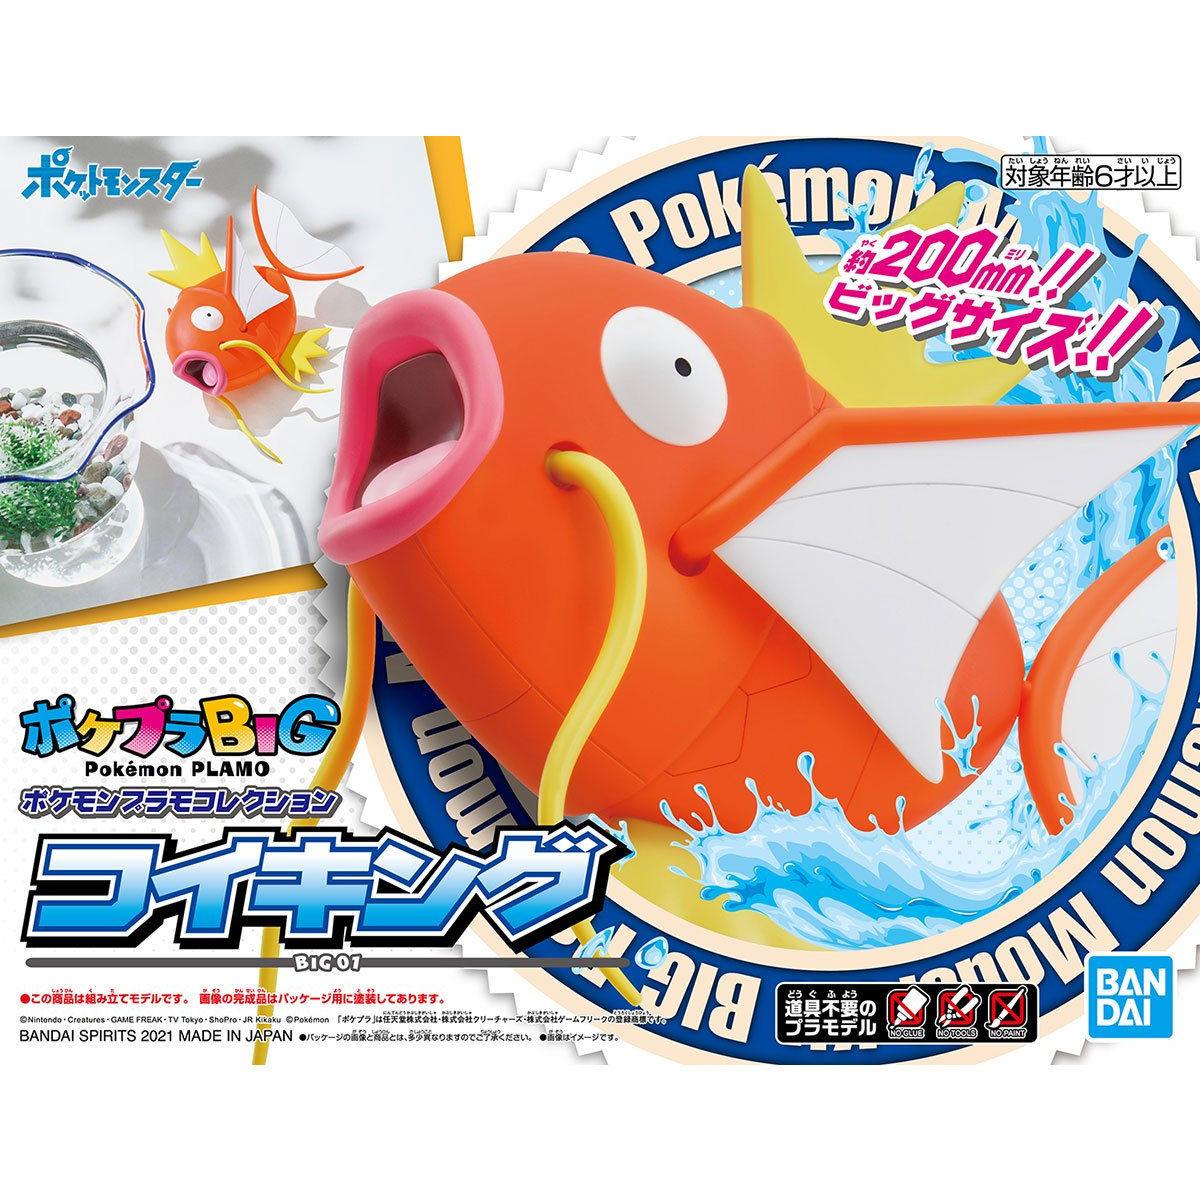 BANDAI 組合模型 POKEPLA 收藏集 巨大版 #01 鯉魚王